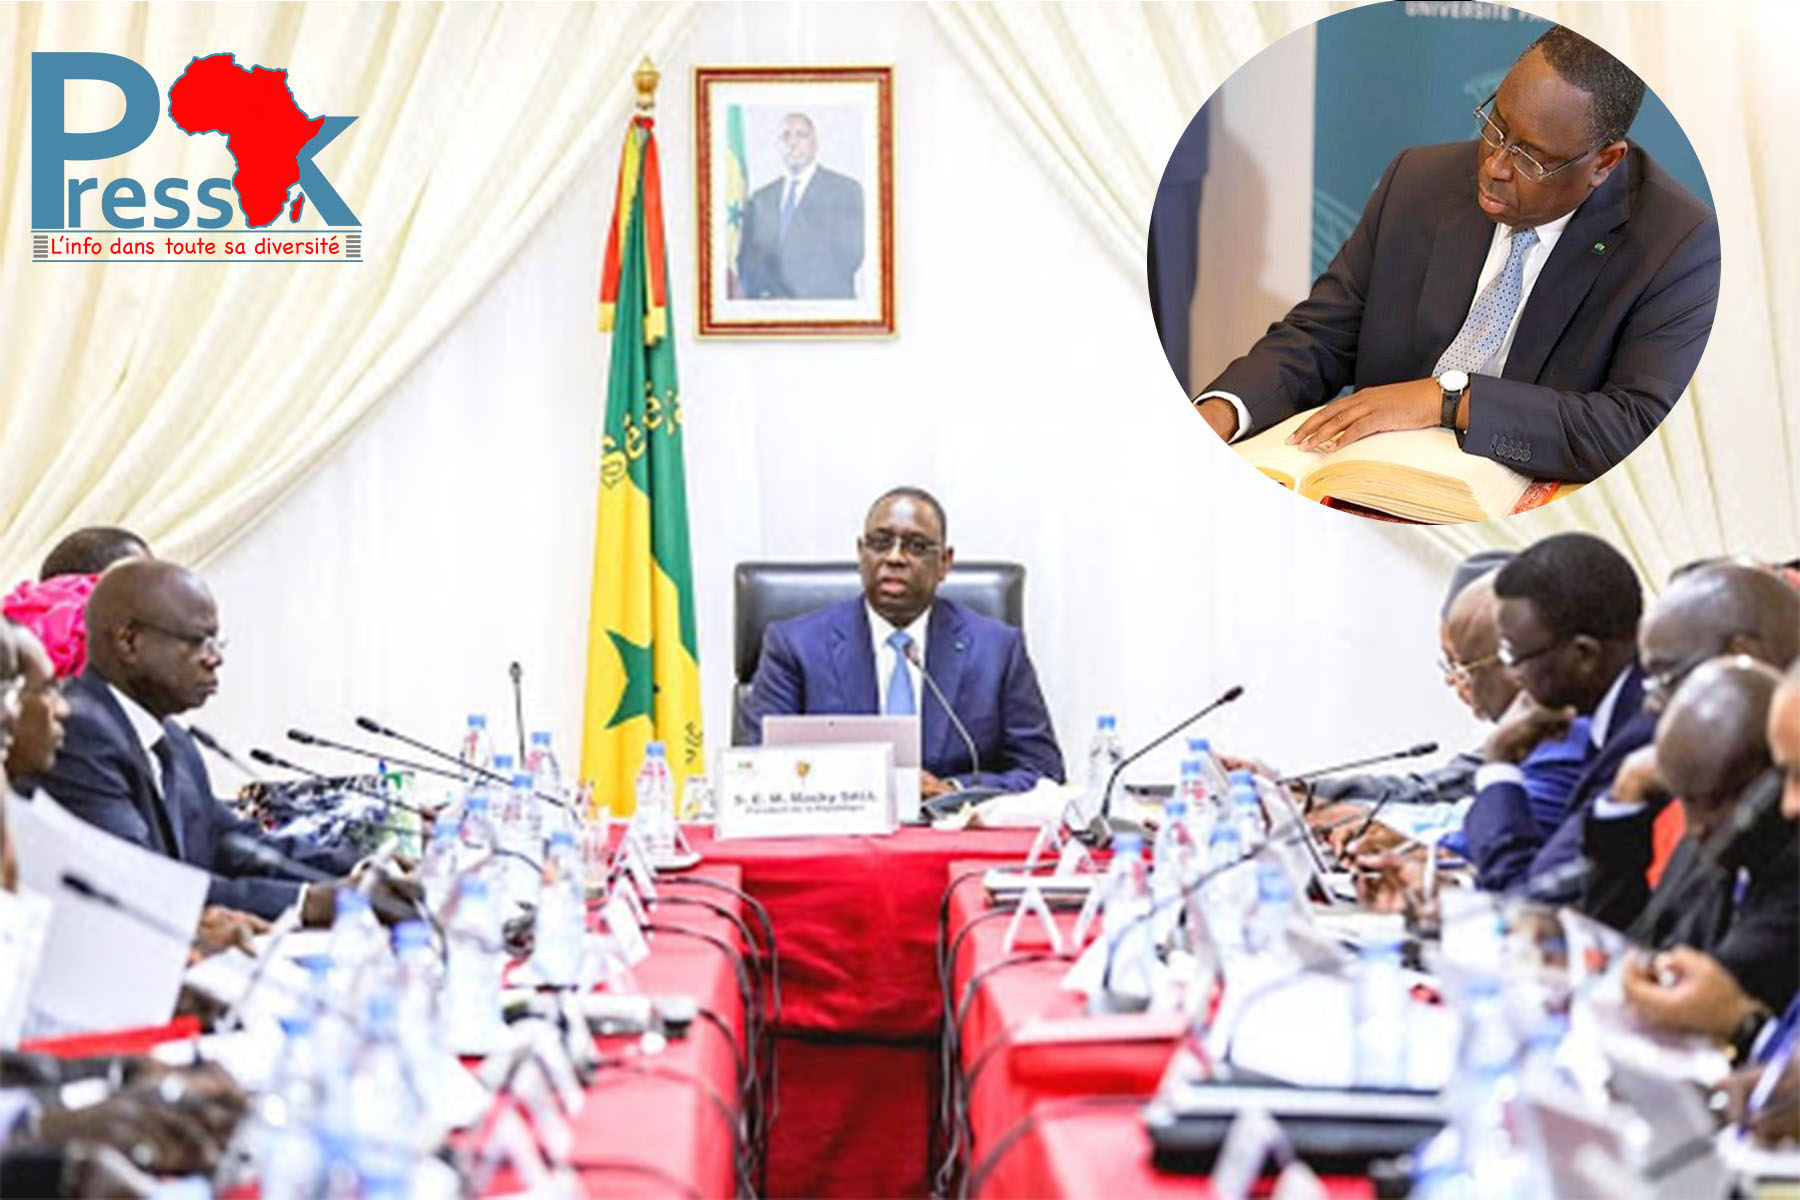 Conseil des ministres : les effets de manche de Macky Sall